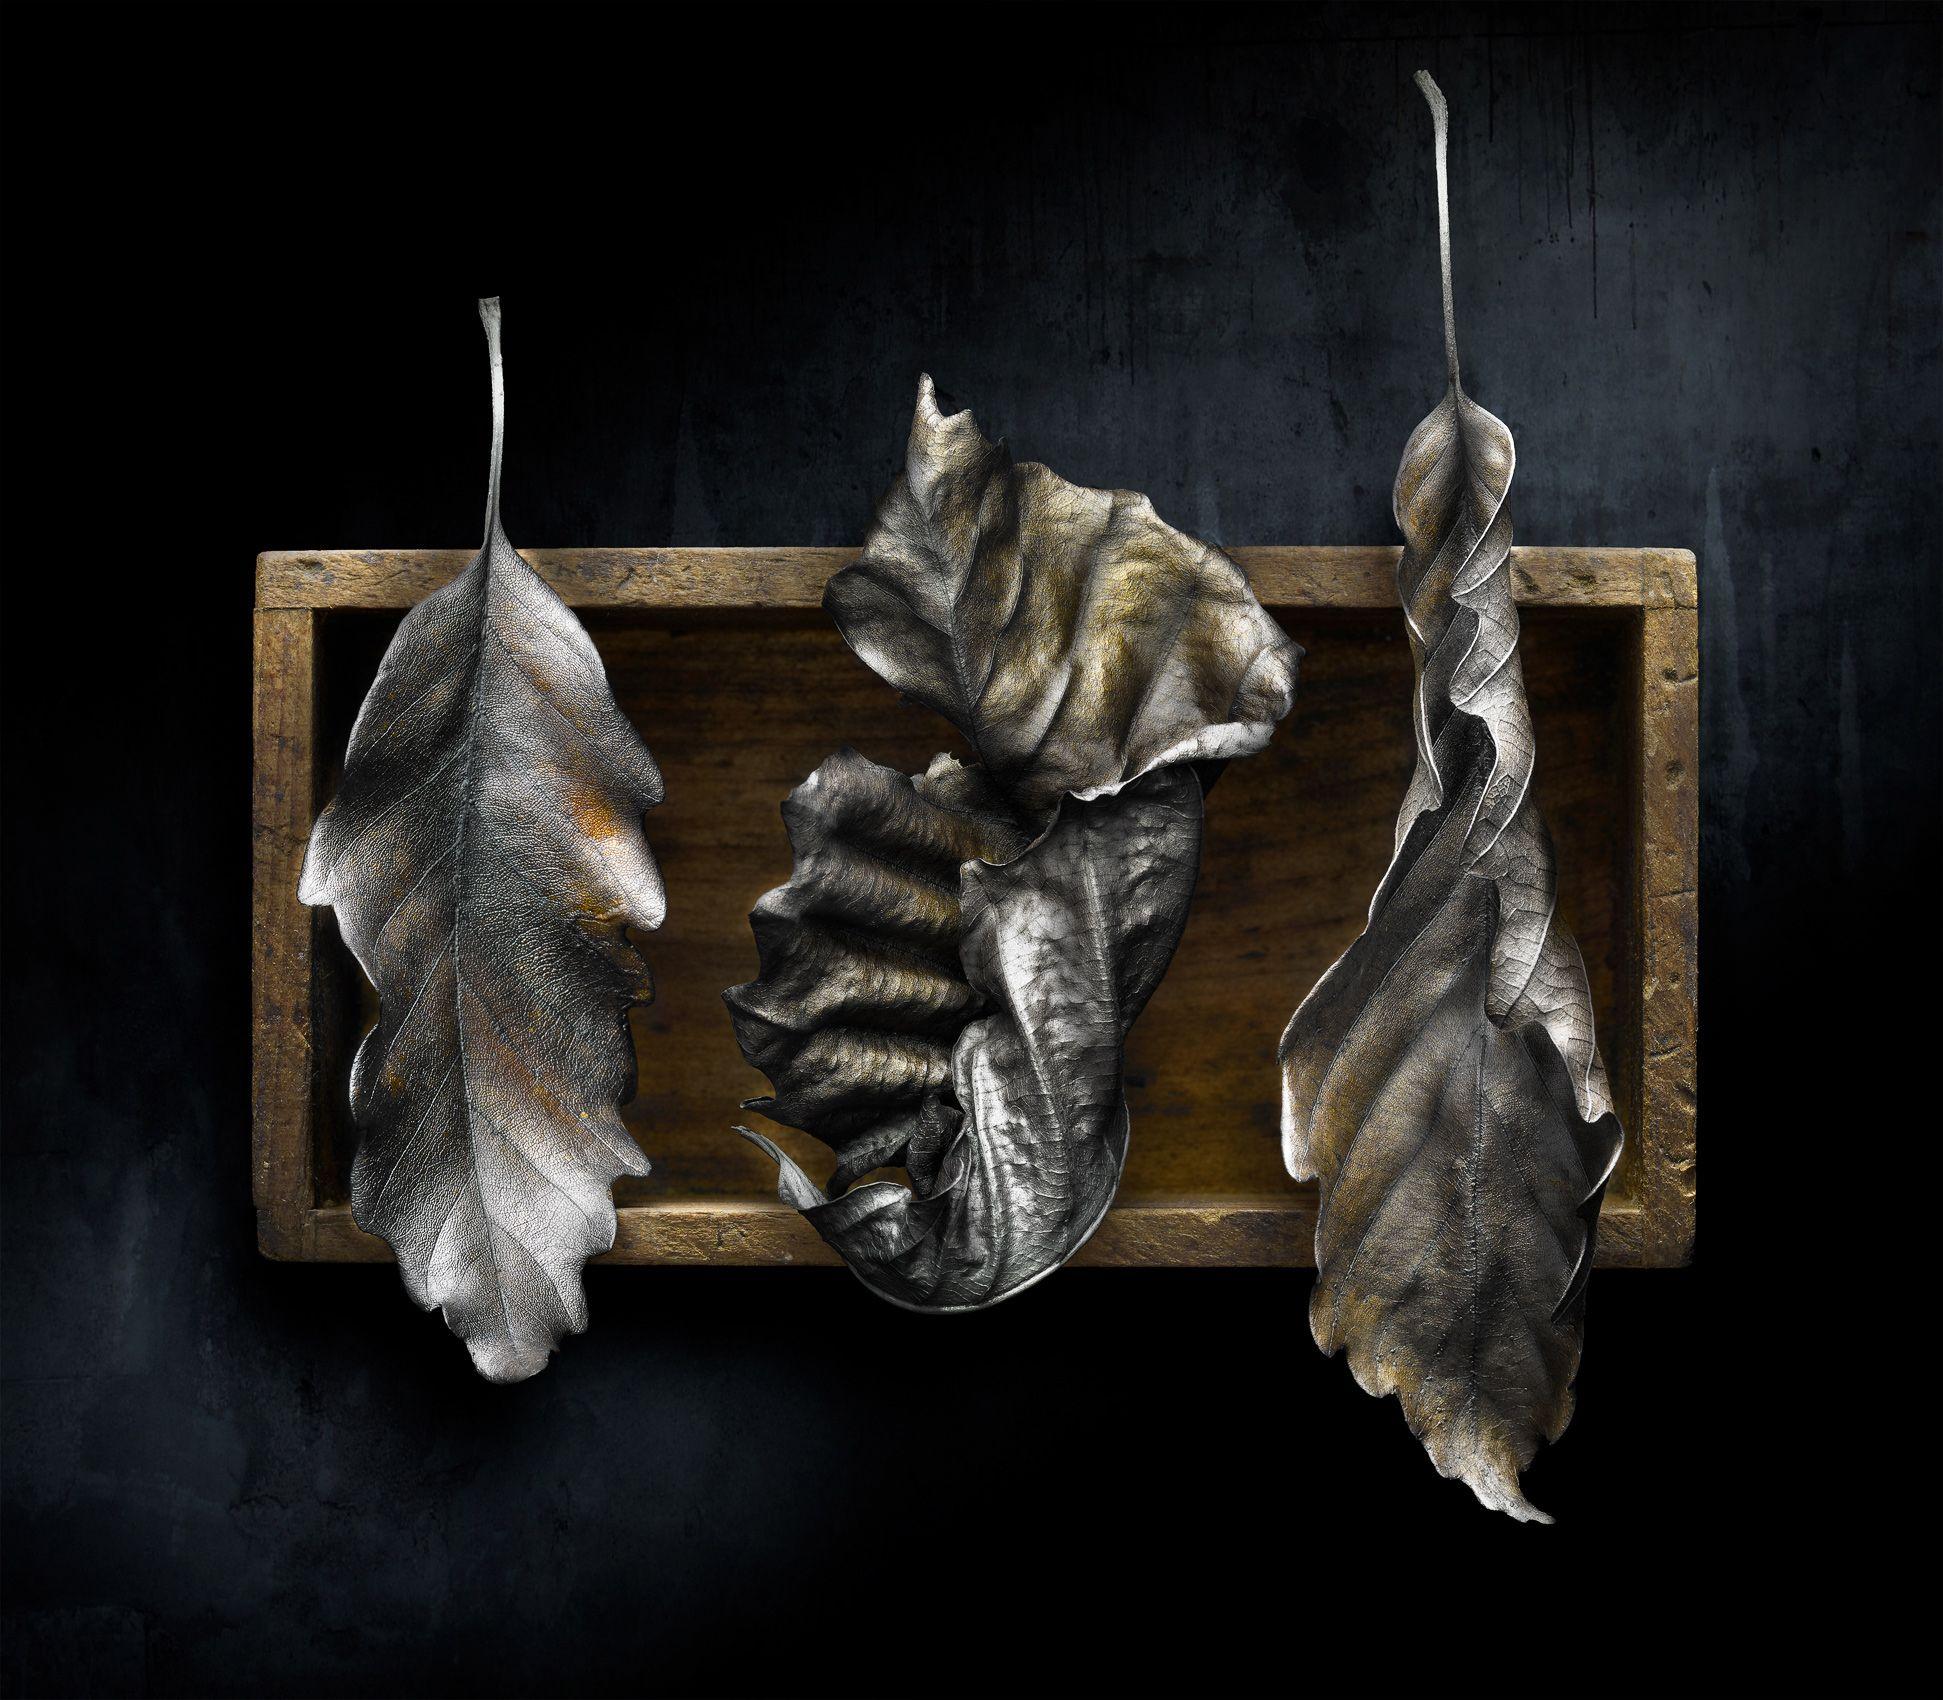 Burnt Offerings #3 by Harold Ross